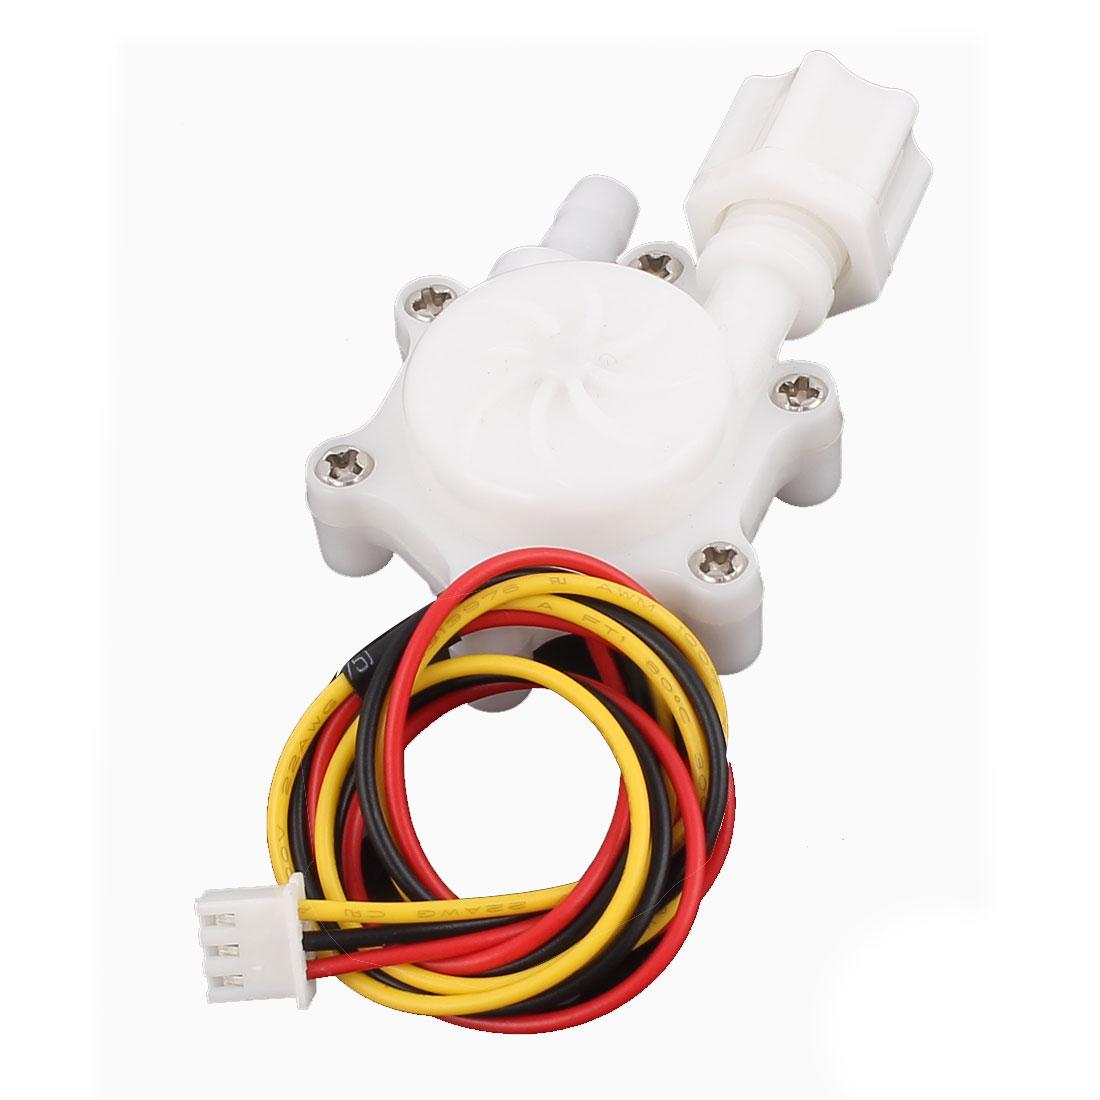 G1/4 Male Thread 6mm Outlet Outer Dia Water Flow Sensor 0.2-2.5L/min SEN-HW06FA